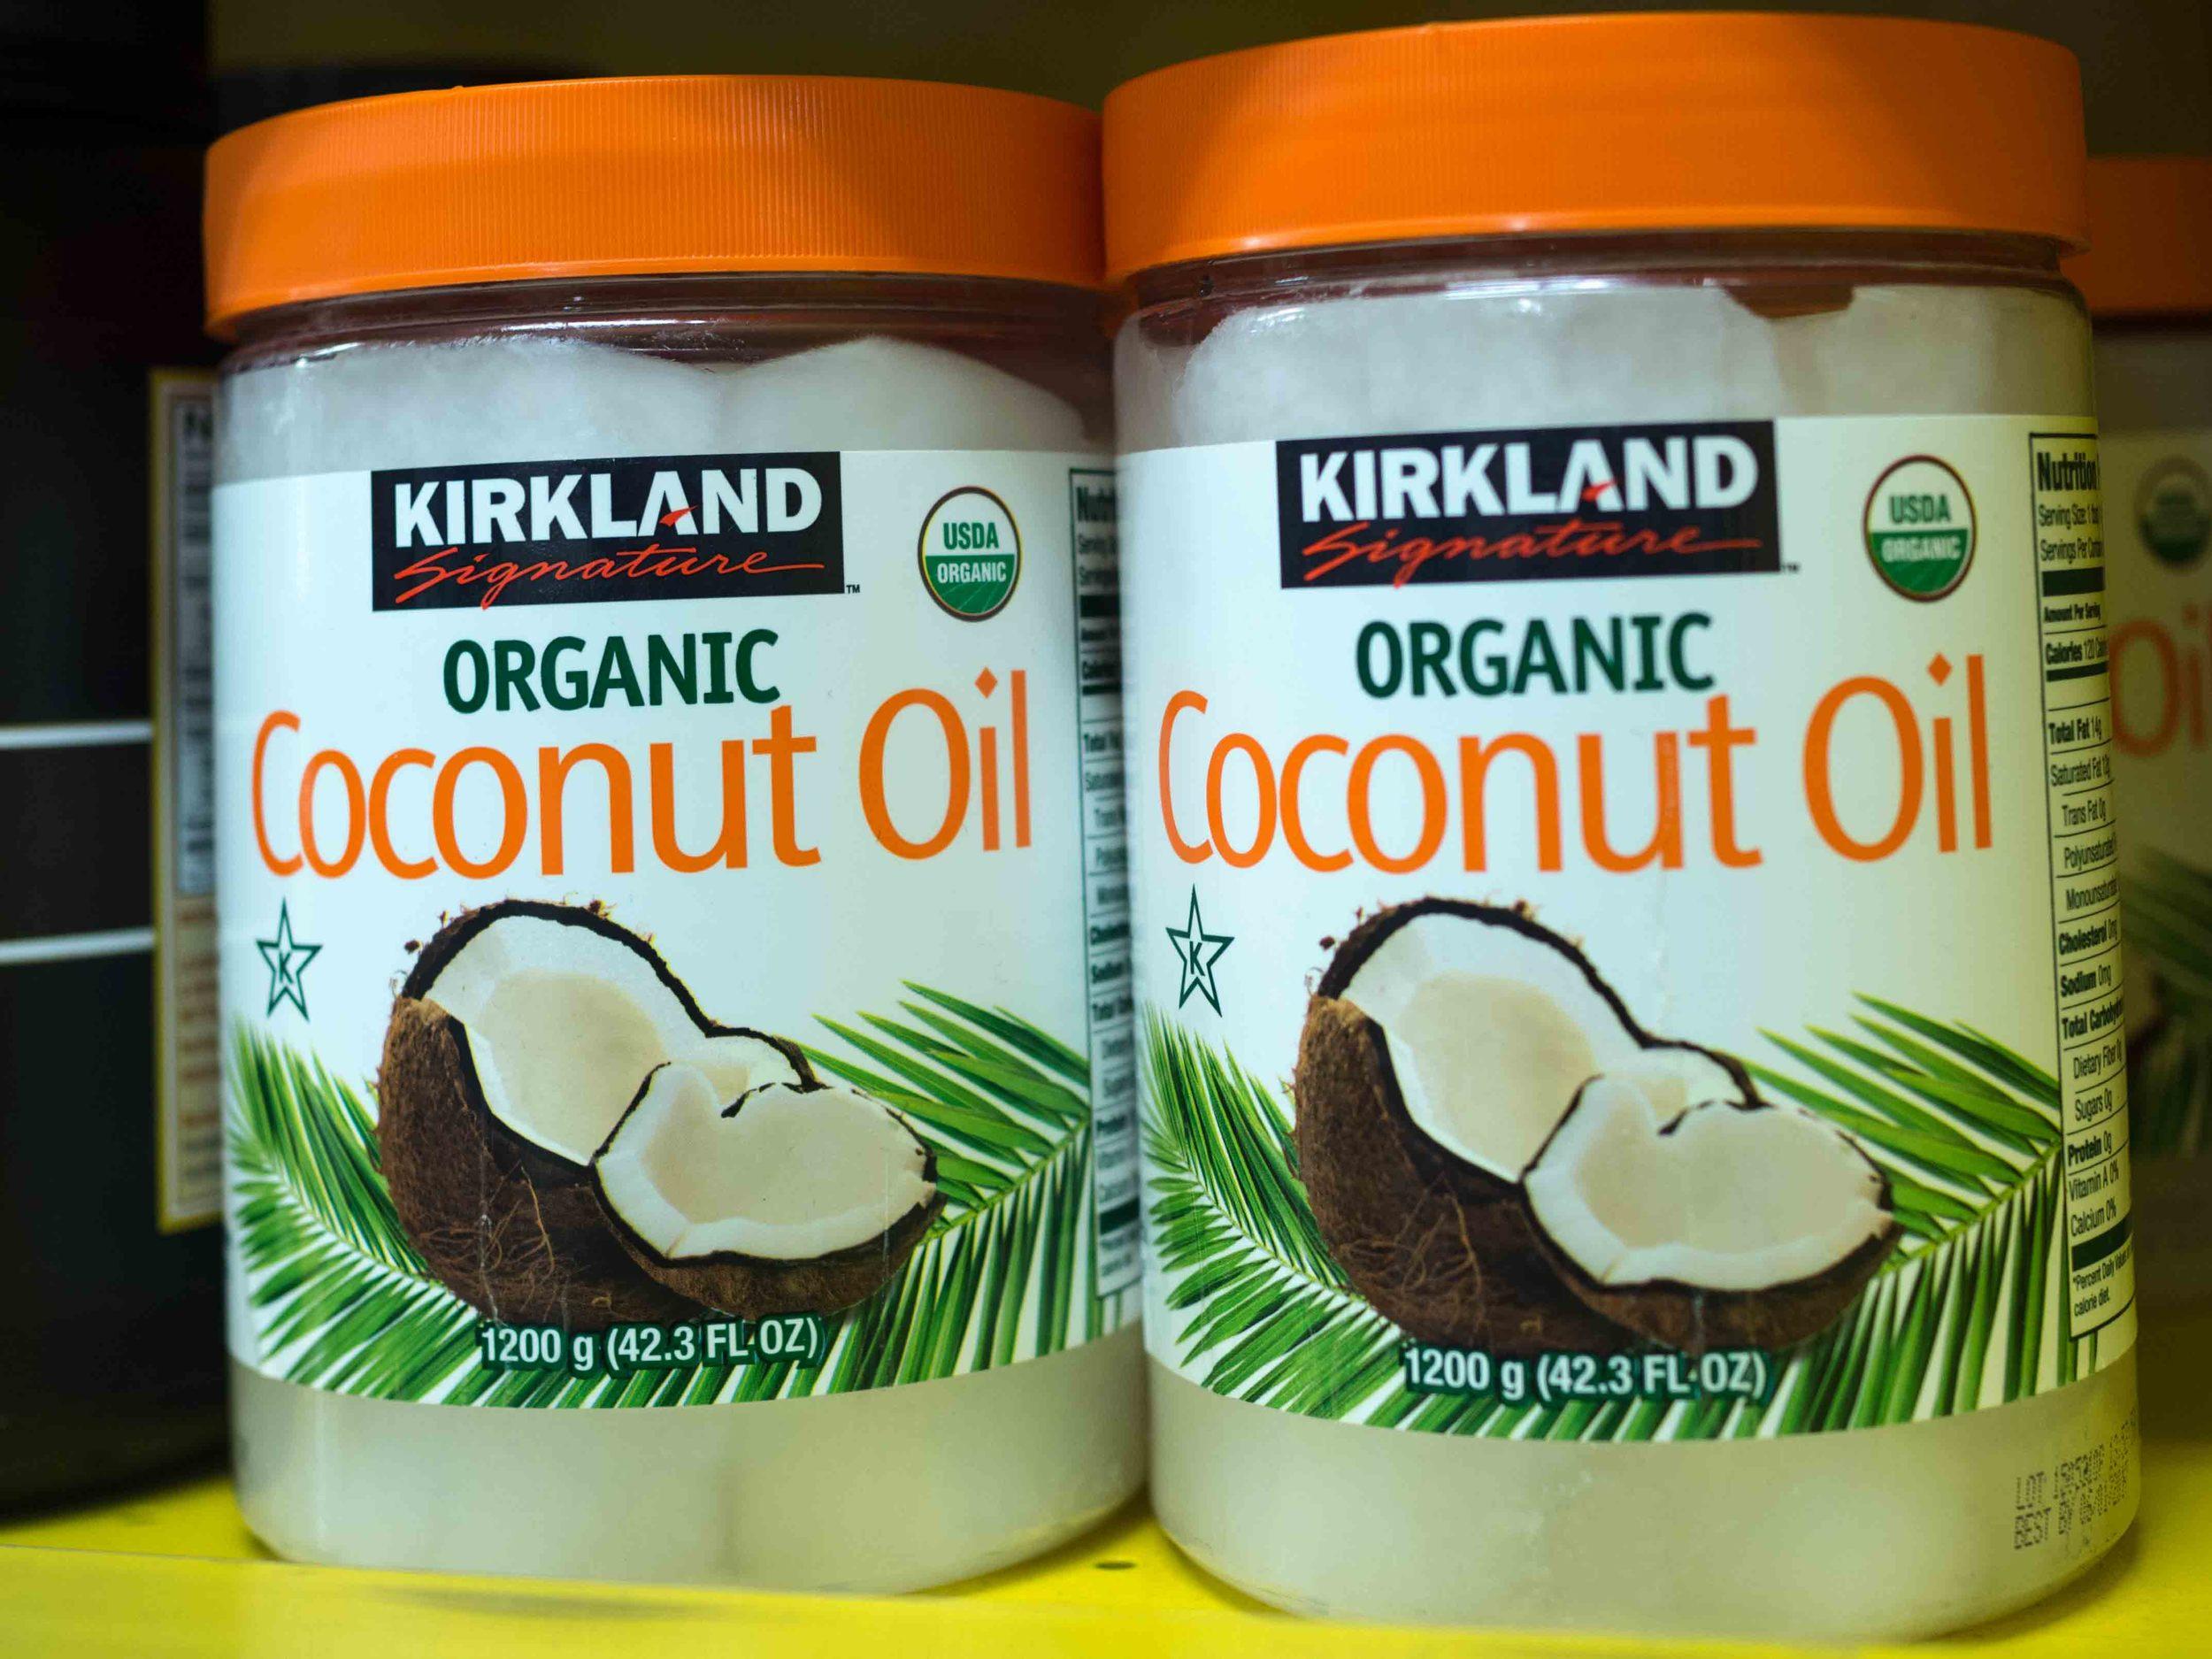 Kirkland Signature Organic